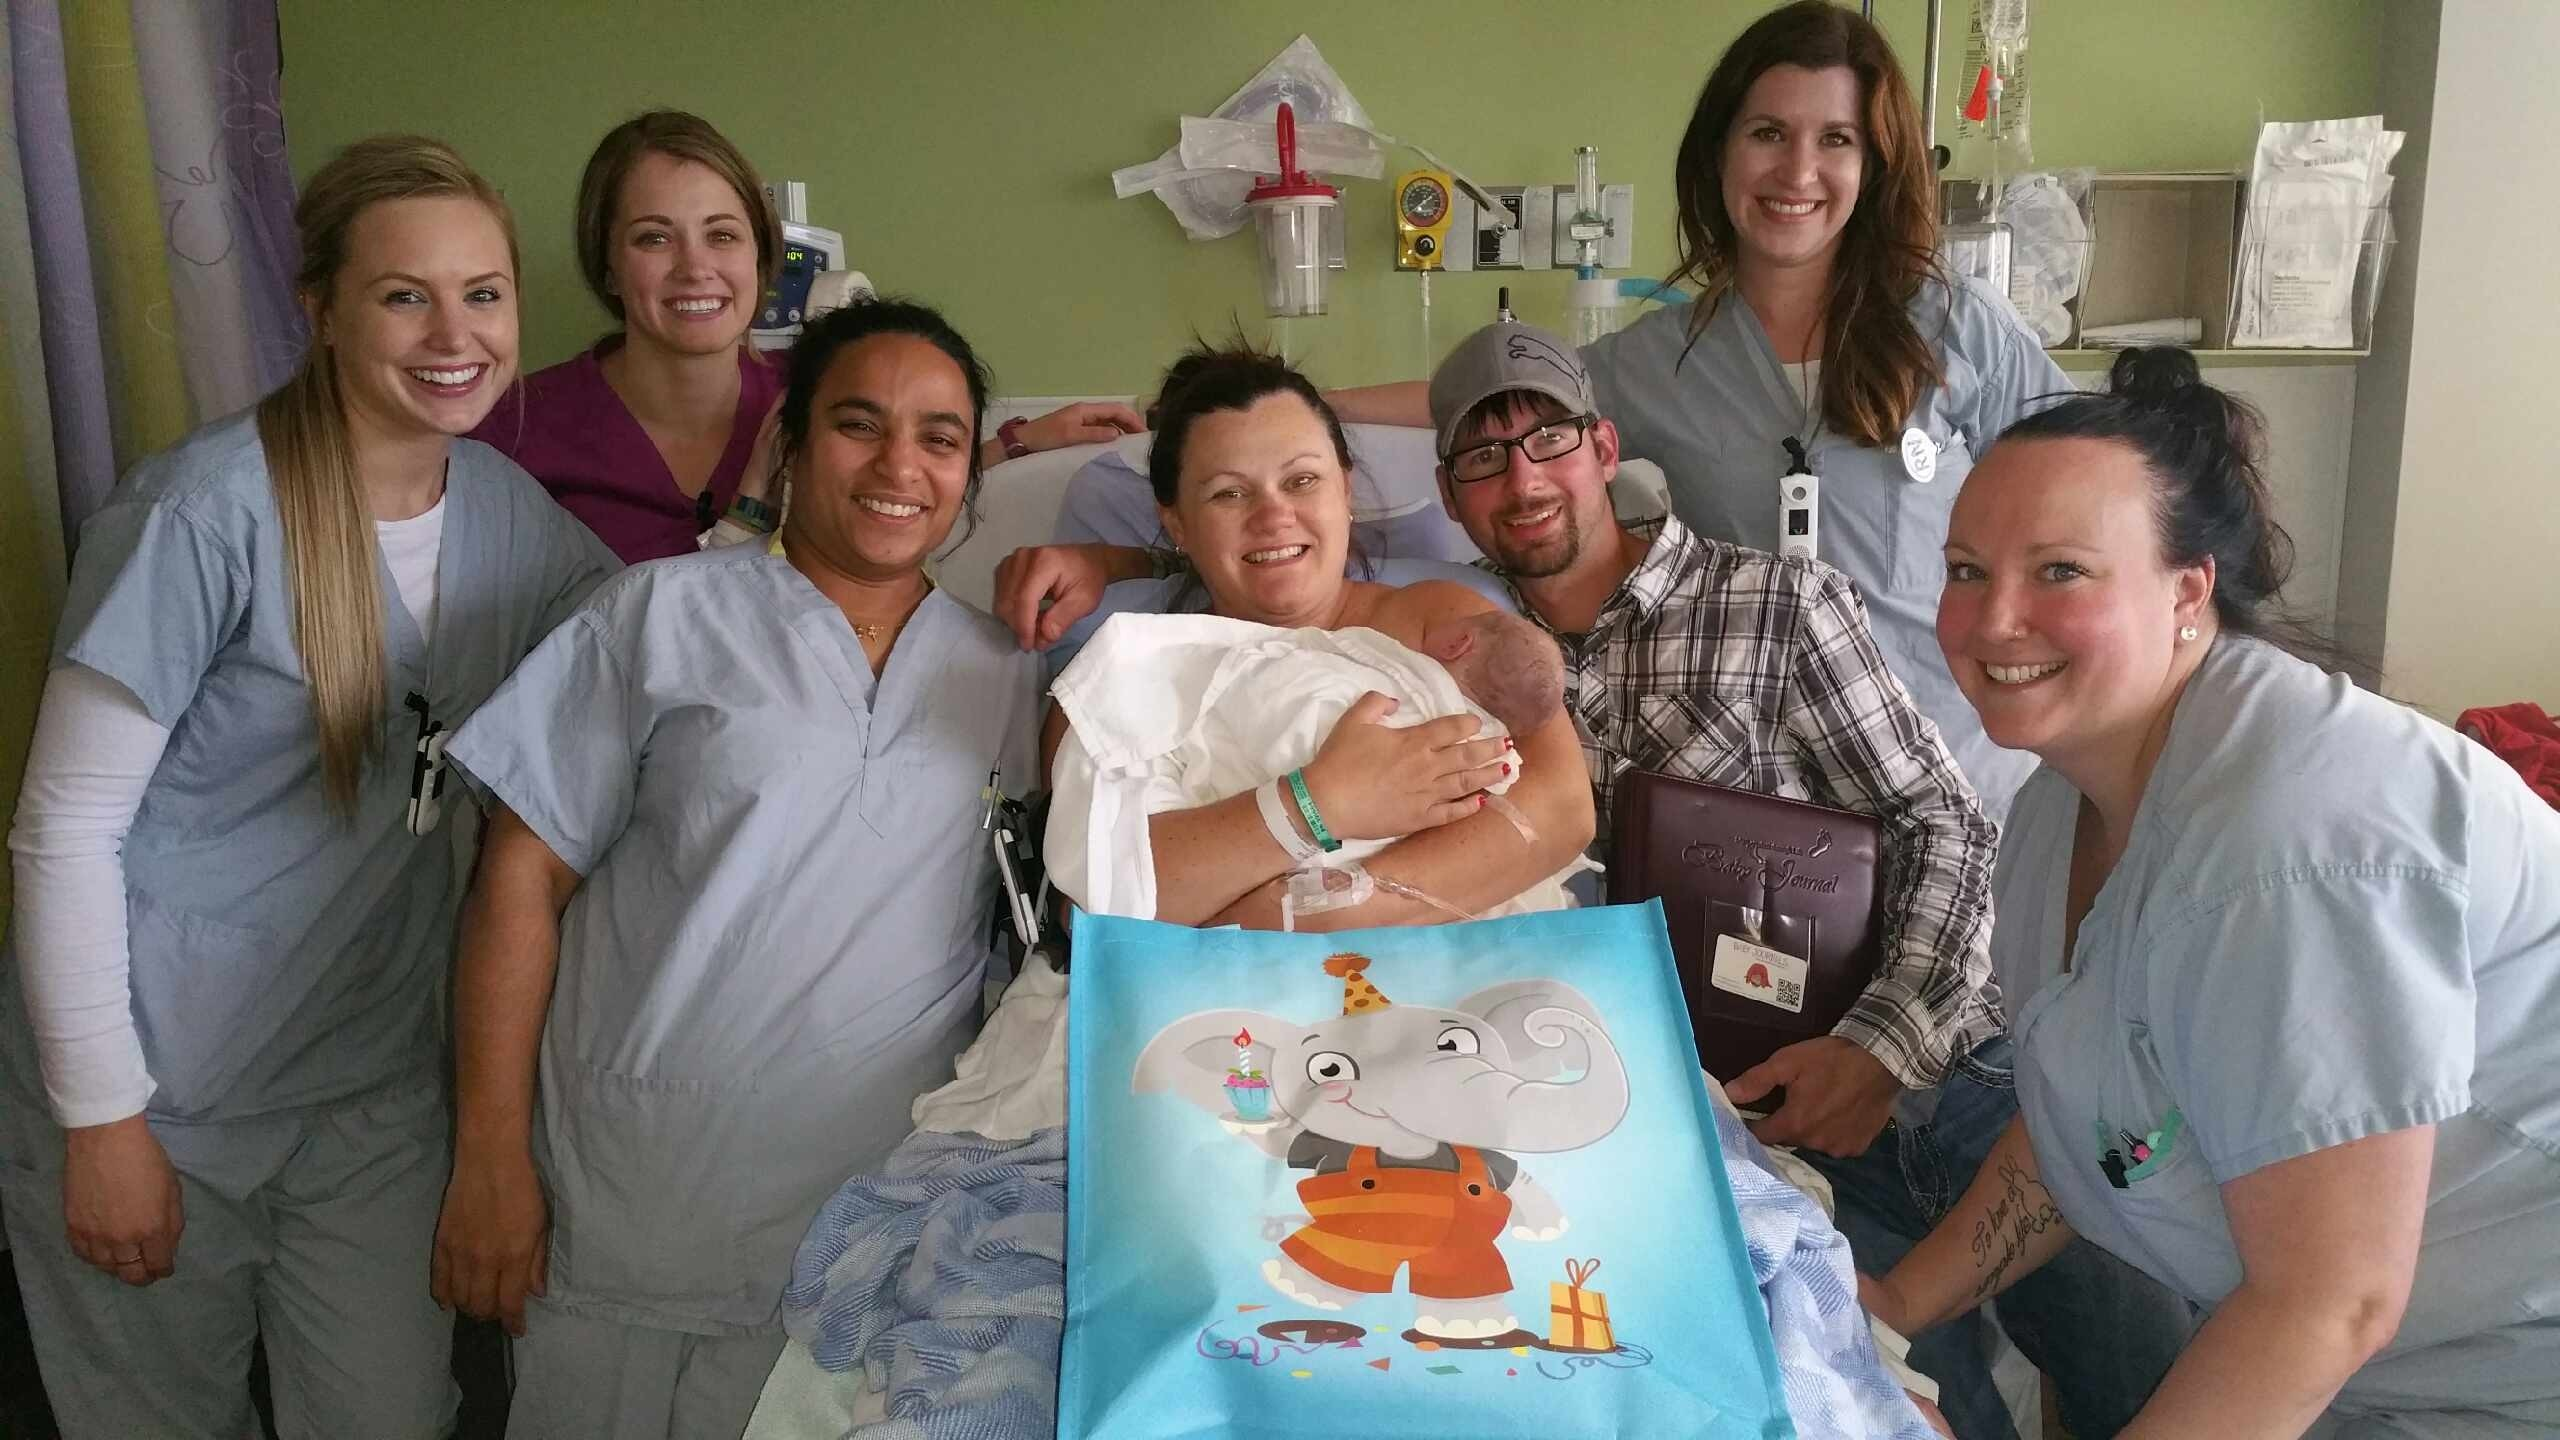 It's a boy! First baby born at NLRHC since evacuation